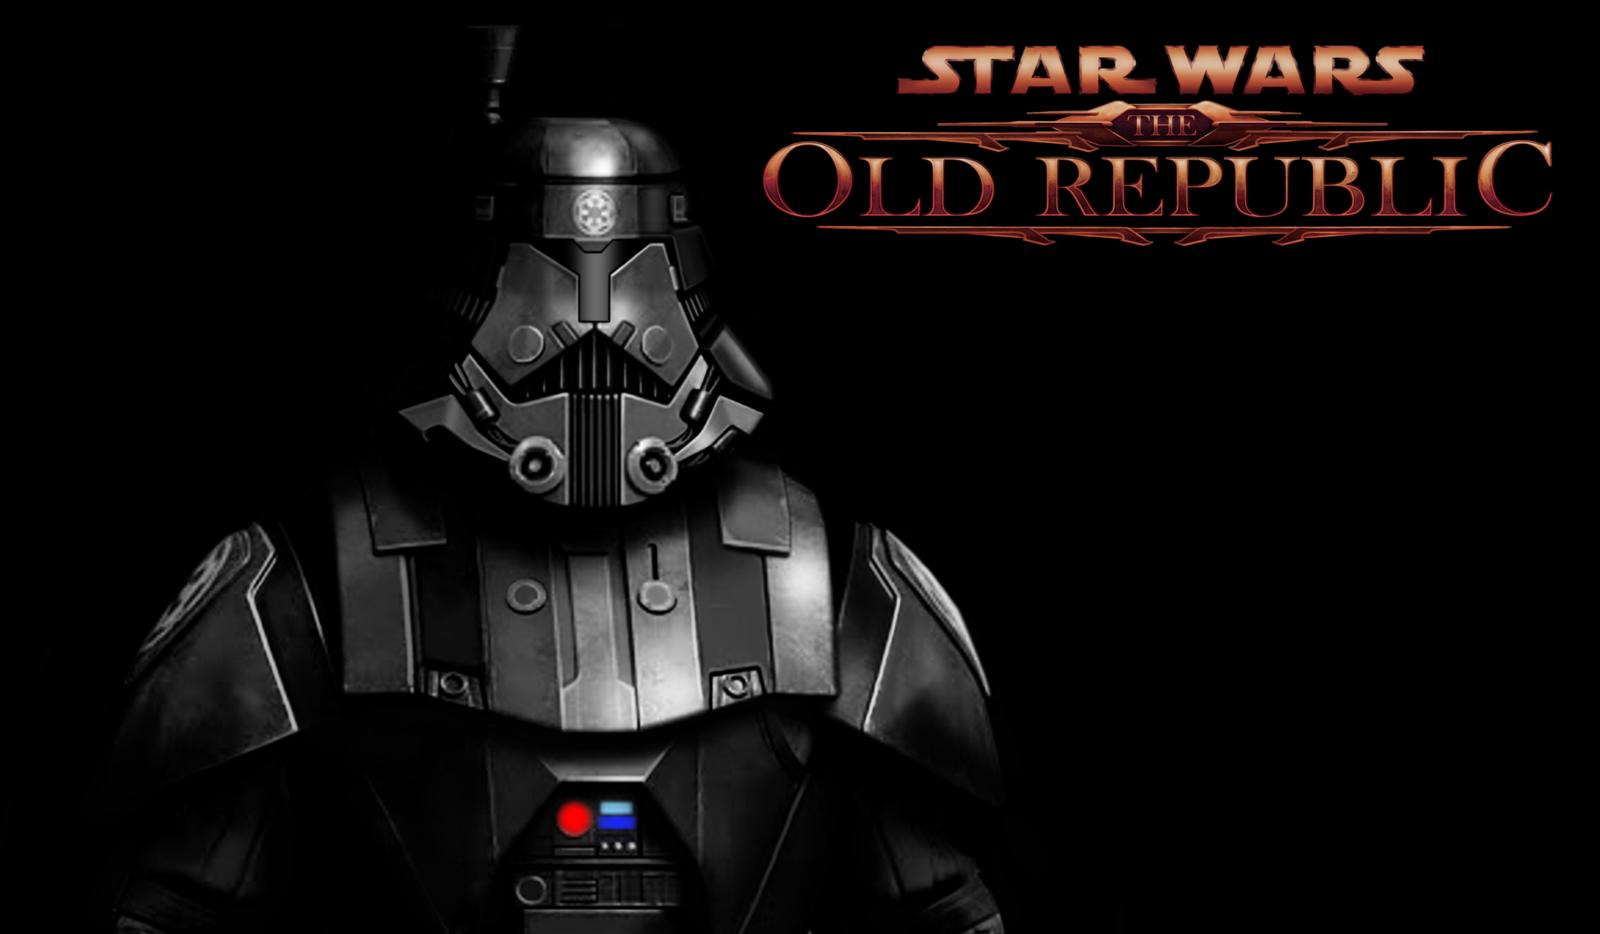 THE OLD REPUBLIC WALLPAPER 4 by zardis1965 1600x934